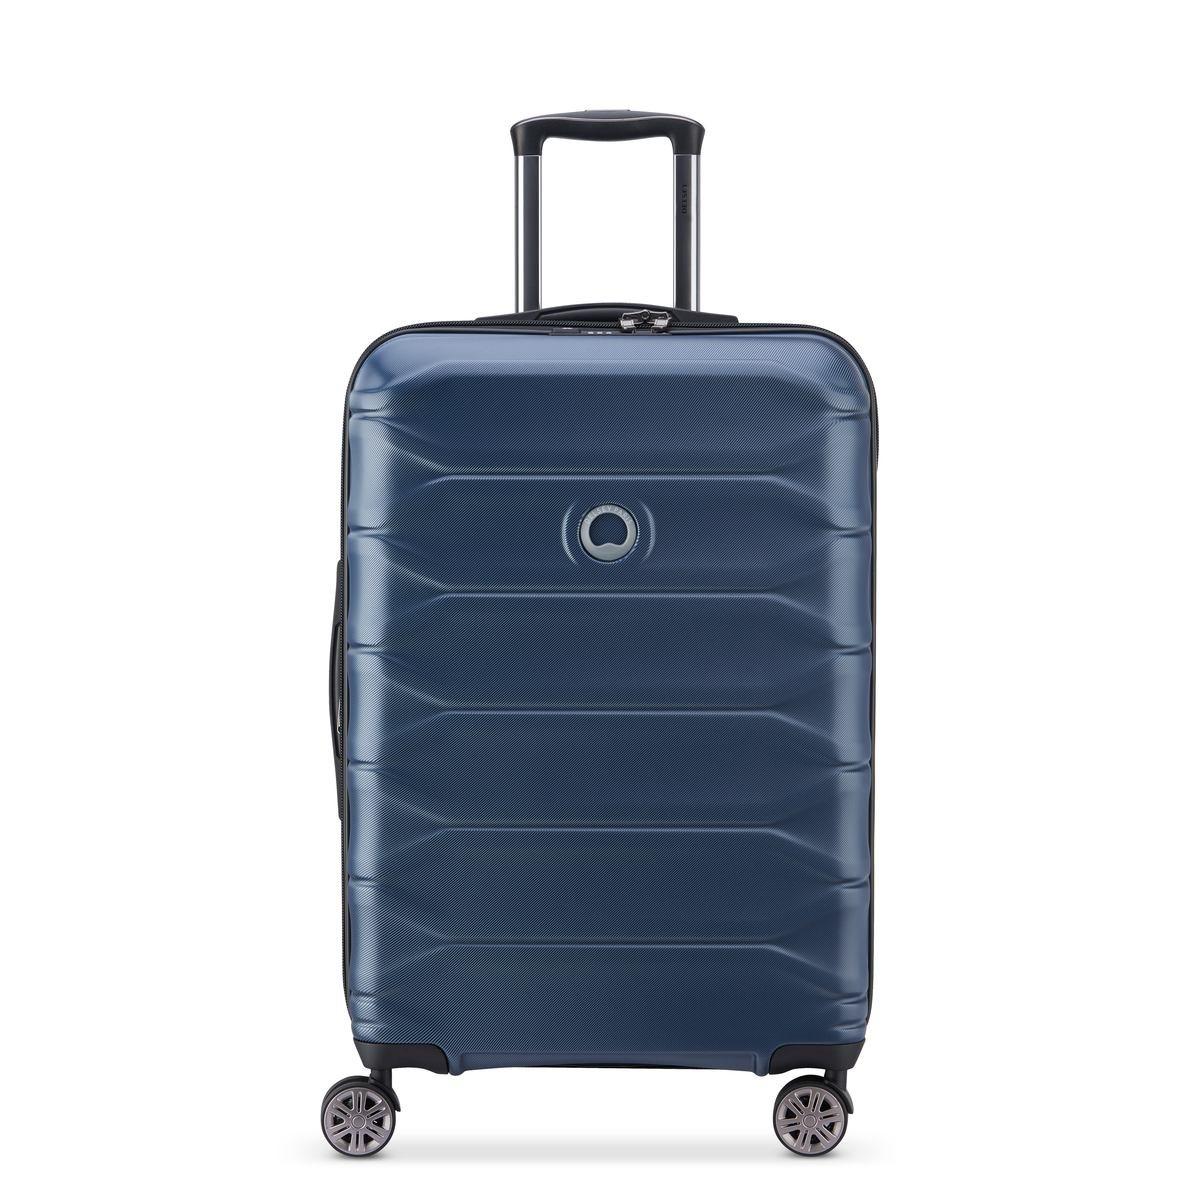 Delsey Βαλίτσα μεσαία expandable 68x44x26.5/29.5cm σειρά Meteor Blue